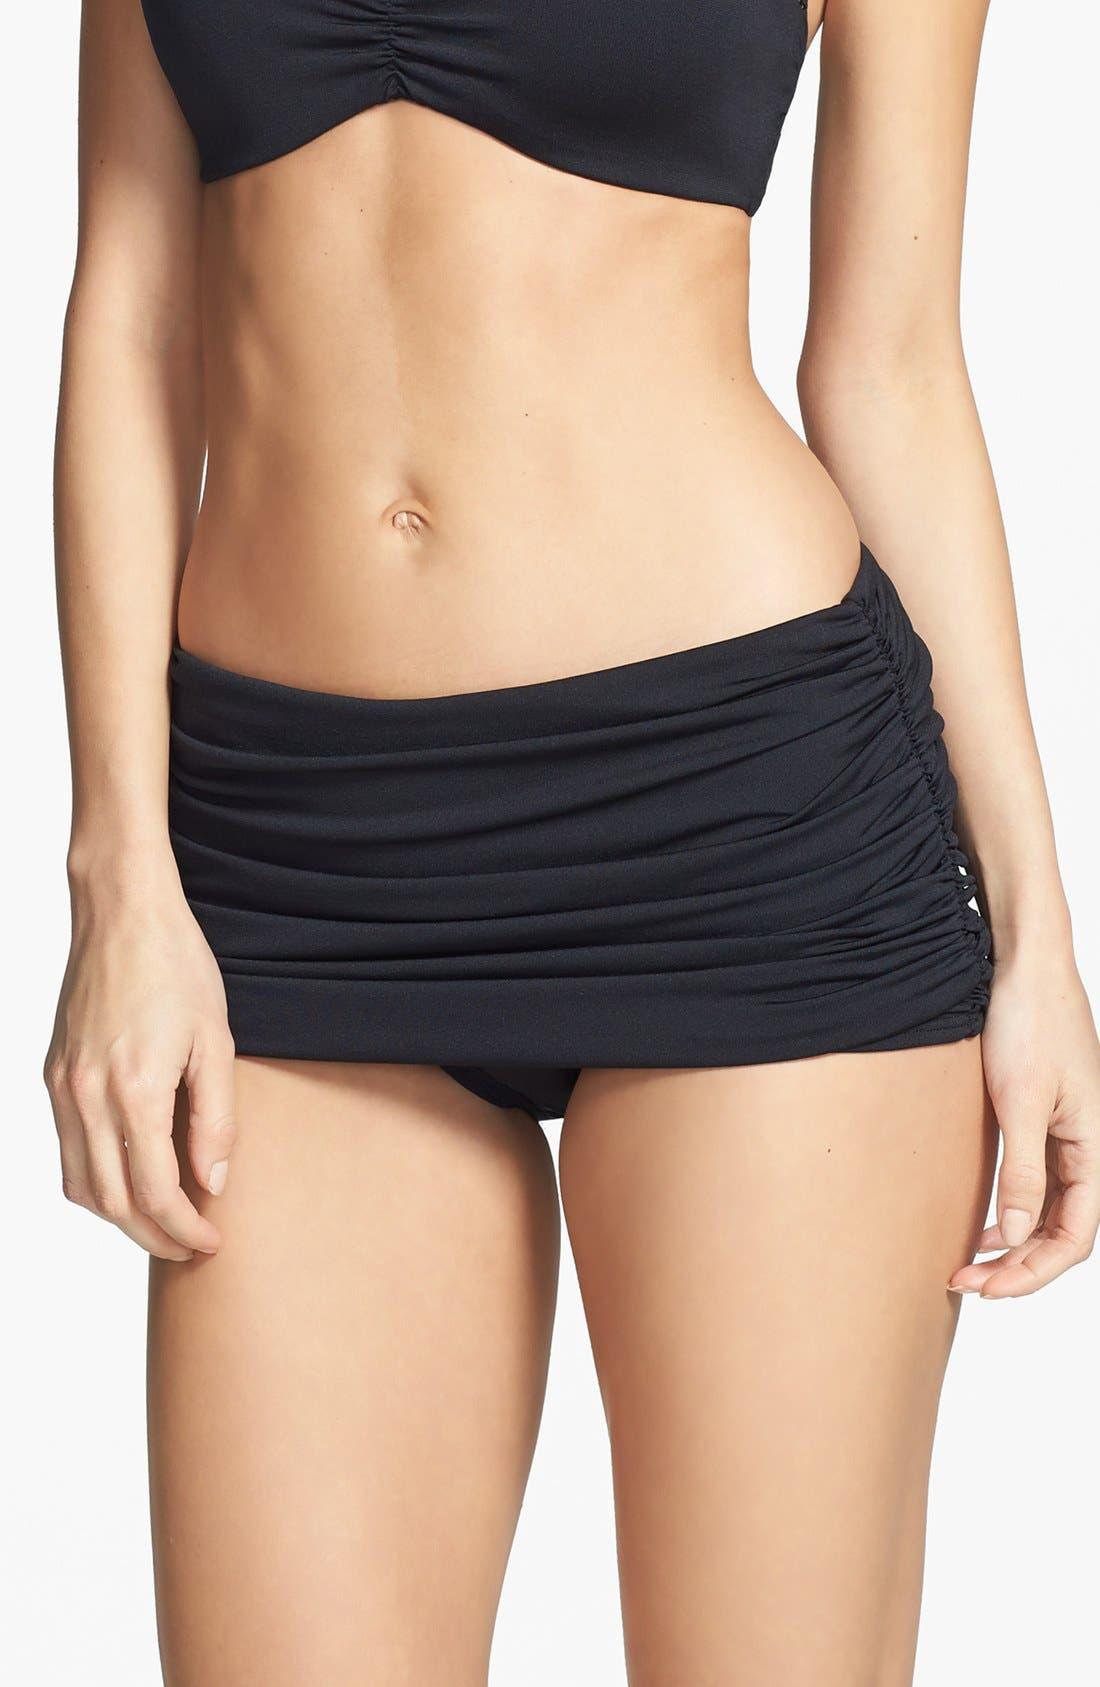 Carmen Marc Valvo 'Cape Town Beach' Shirred Skirted Bikini Bottoms,                         Main,                         color,